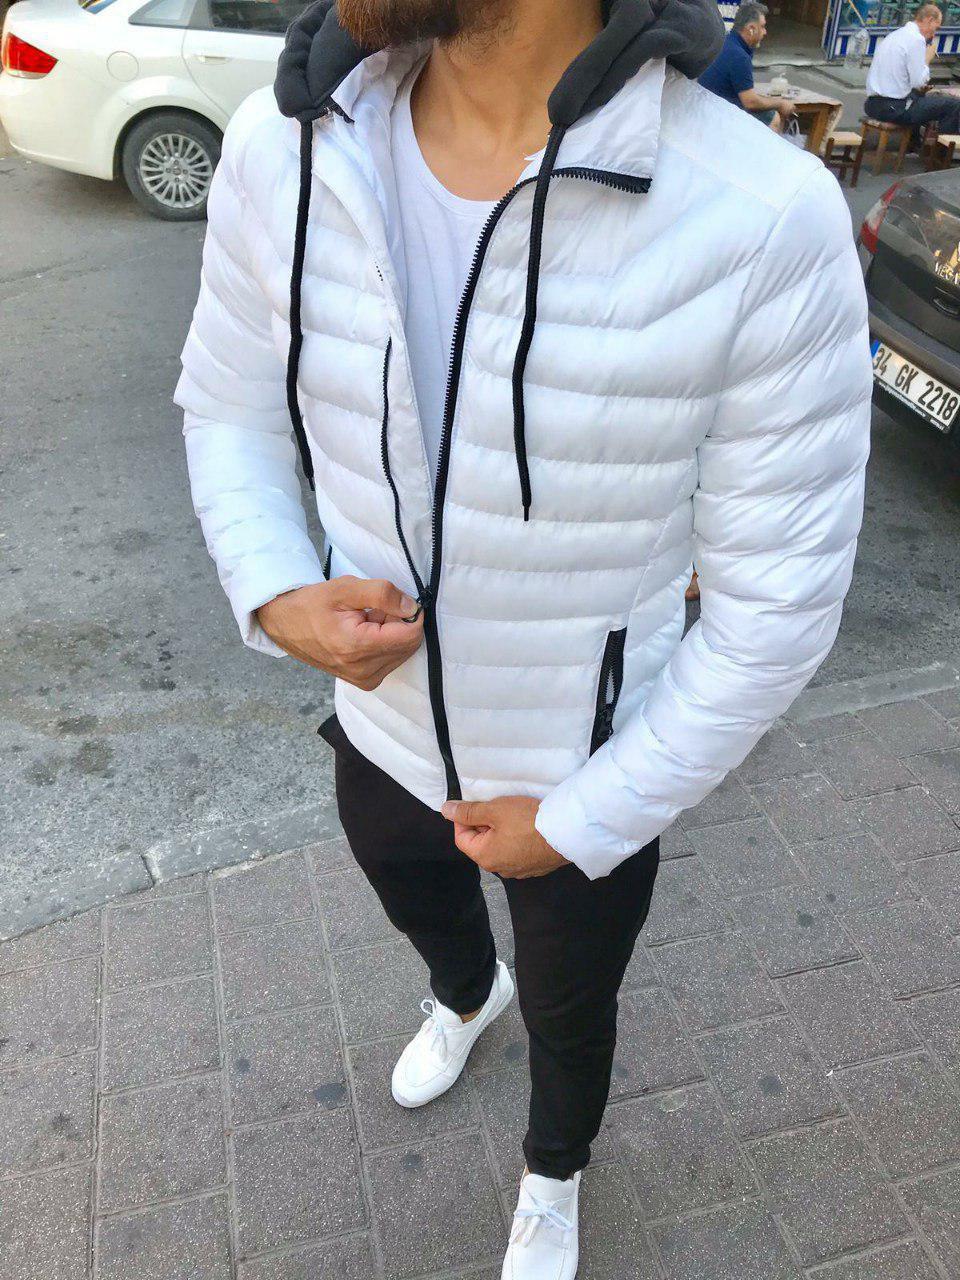 😜 Куртка - Мужскаяя куртка з с утепленным капюшоном белая